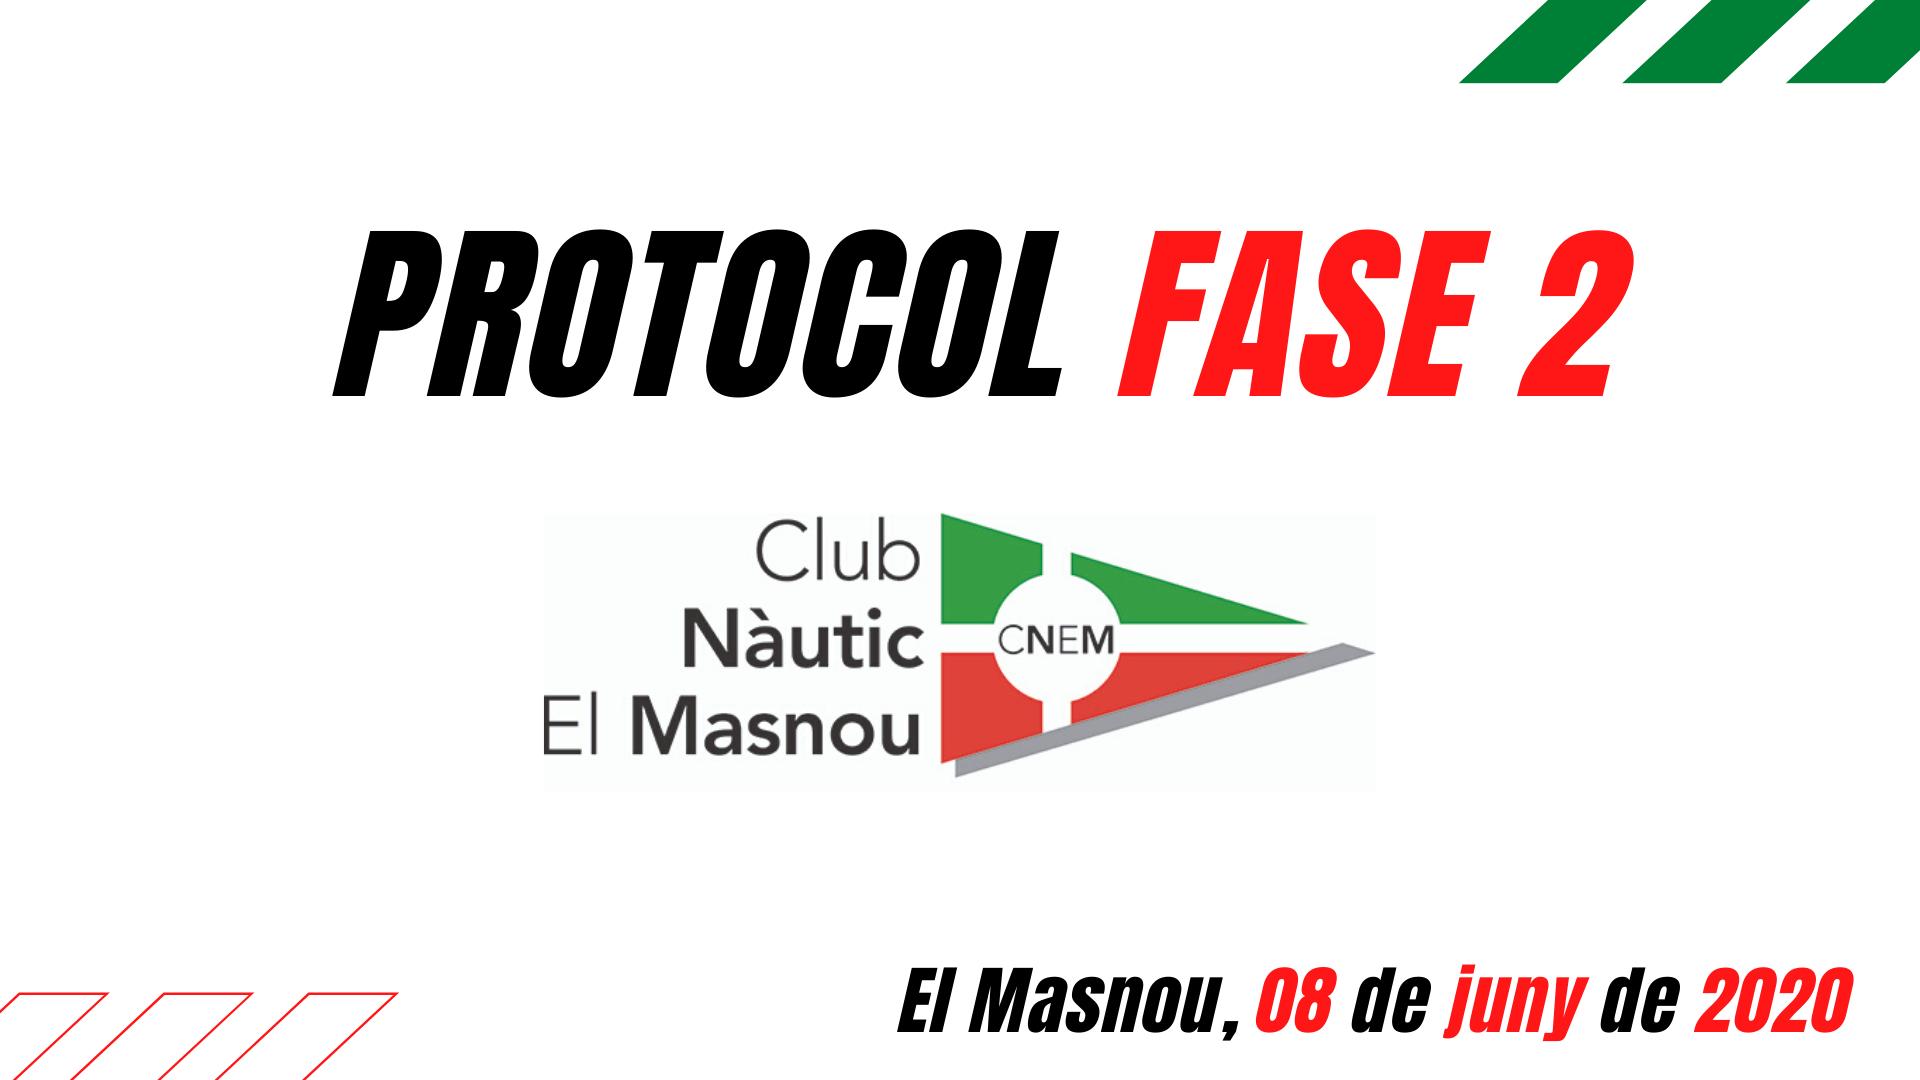 Protocol FASE 2 Club Nàutic El Masnou - cnem, covid19, pandèmia, protocol -